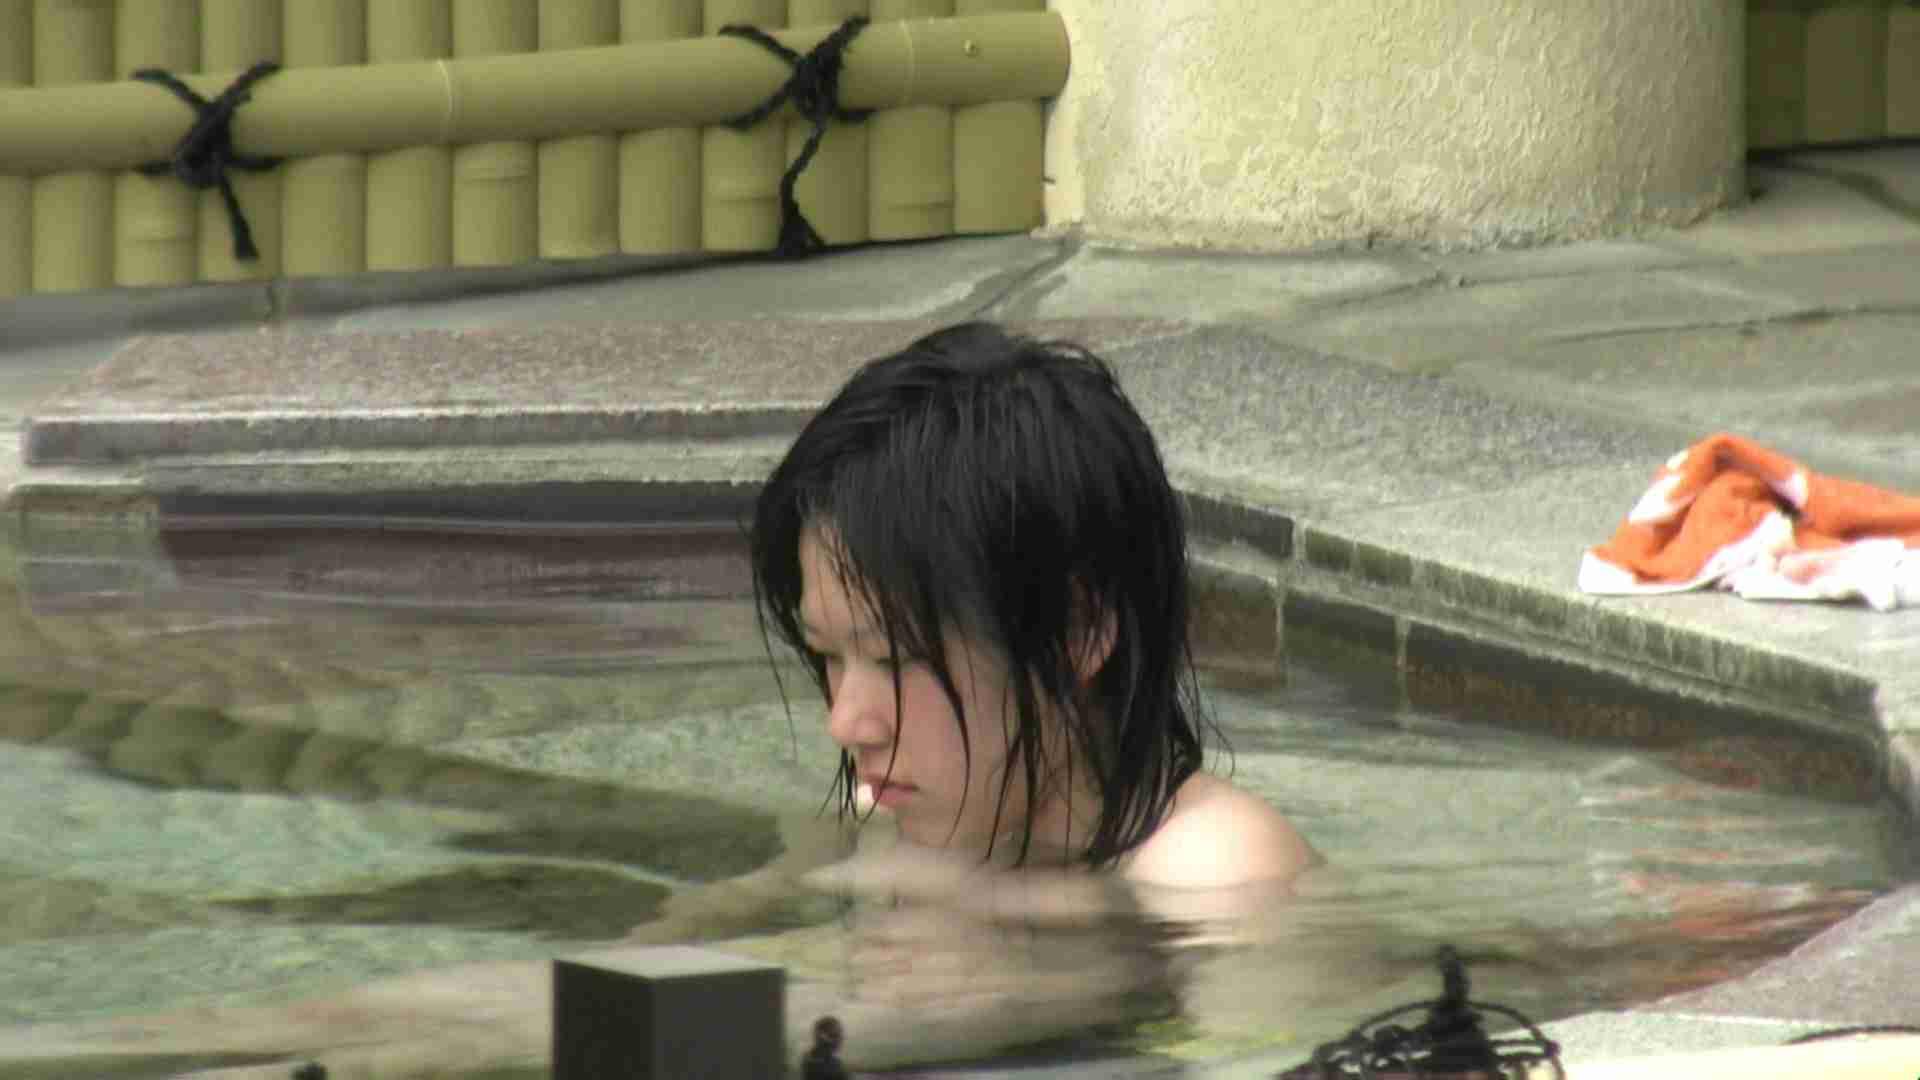 Aquaな露天風呂Vol.36 盗撮 | HなOL  68pic 19